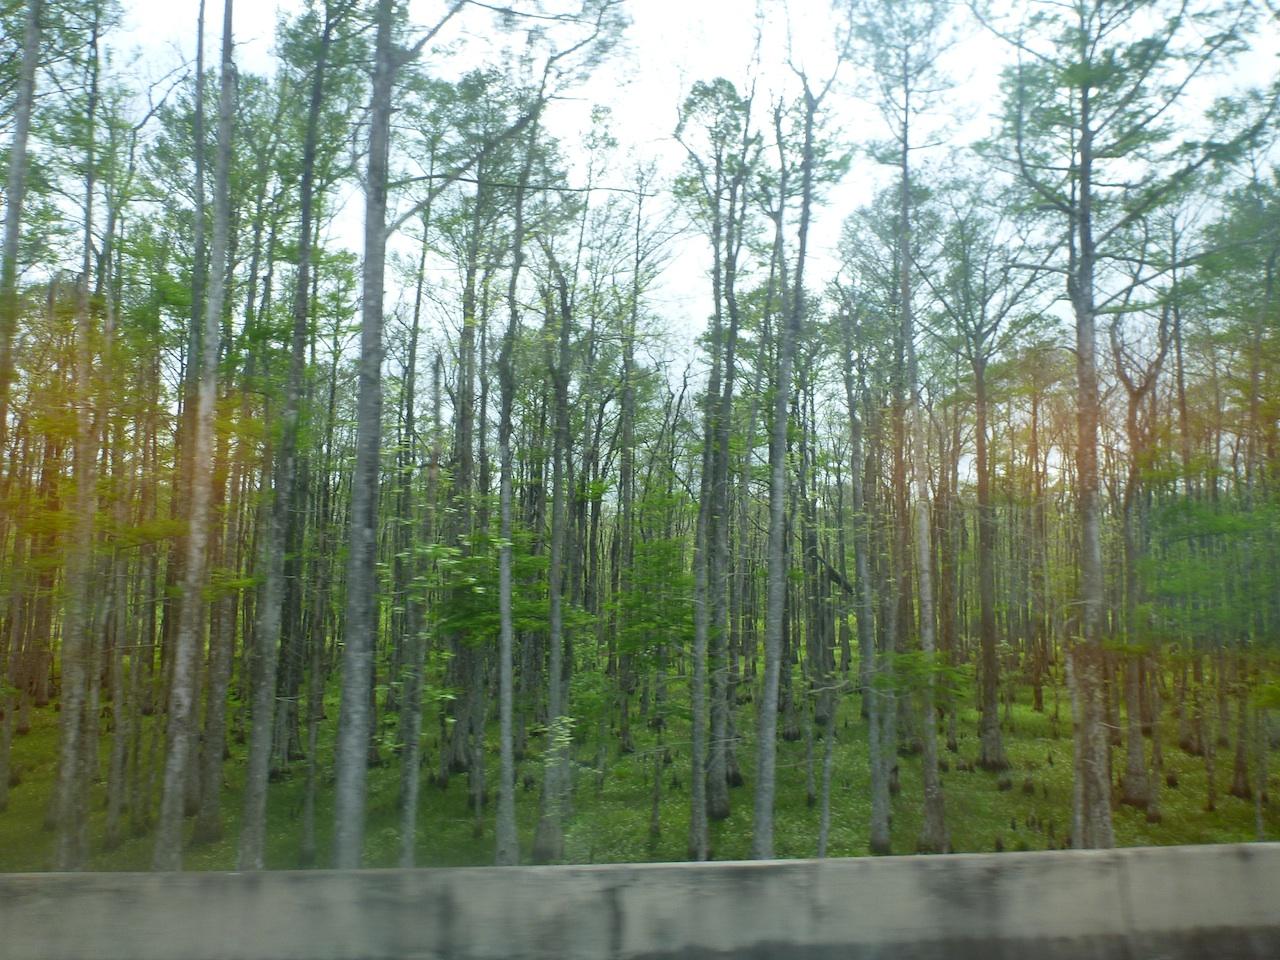 The Swamp Land Driving Down To Houma, LA